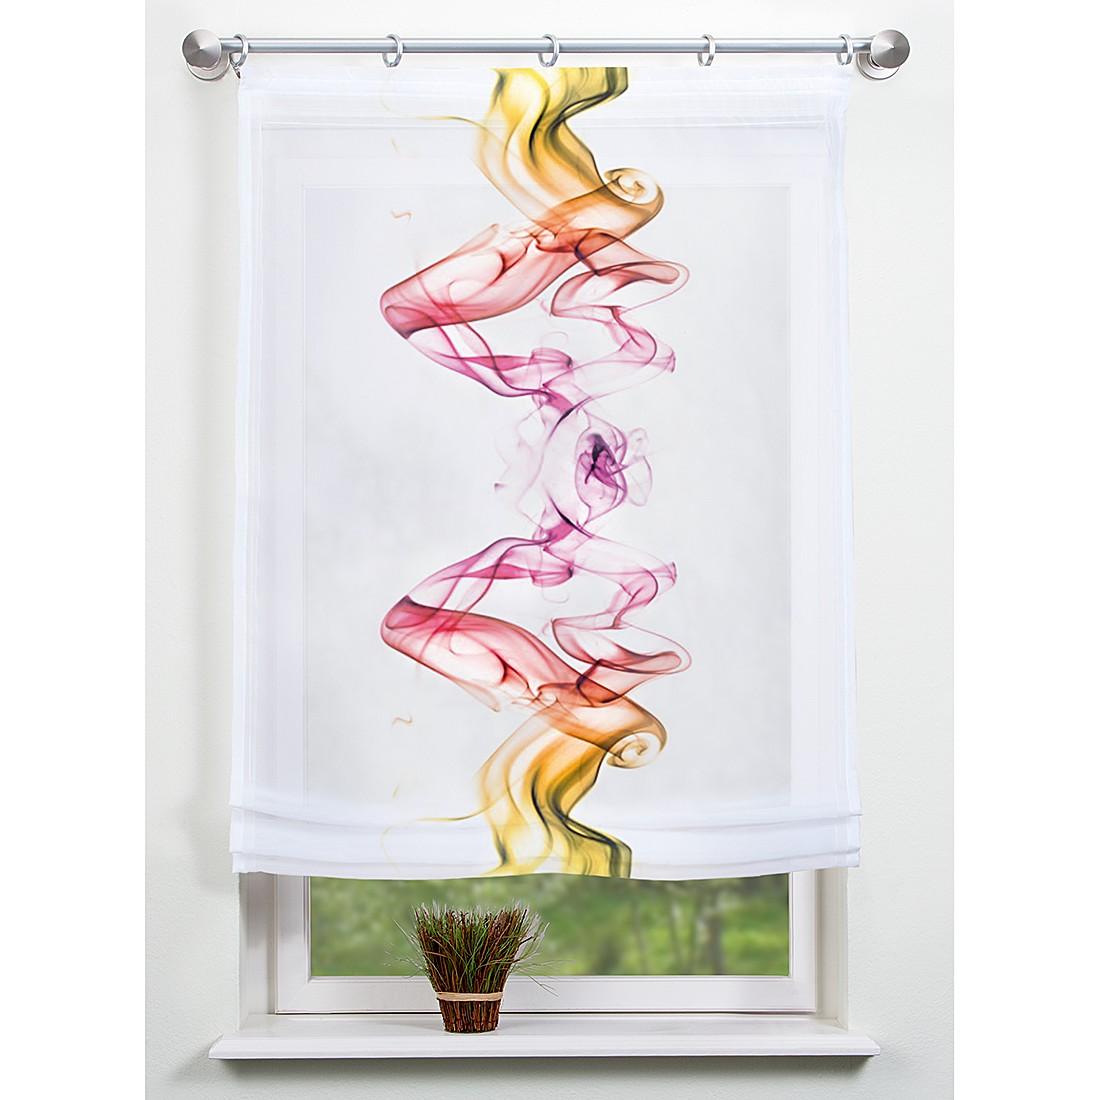 raffrollo chester multicolor 45 x 140 cm home wohnideen g nstig kaufen. Black Bedroom Furniture Sets. Home Design Ideas